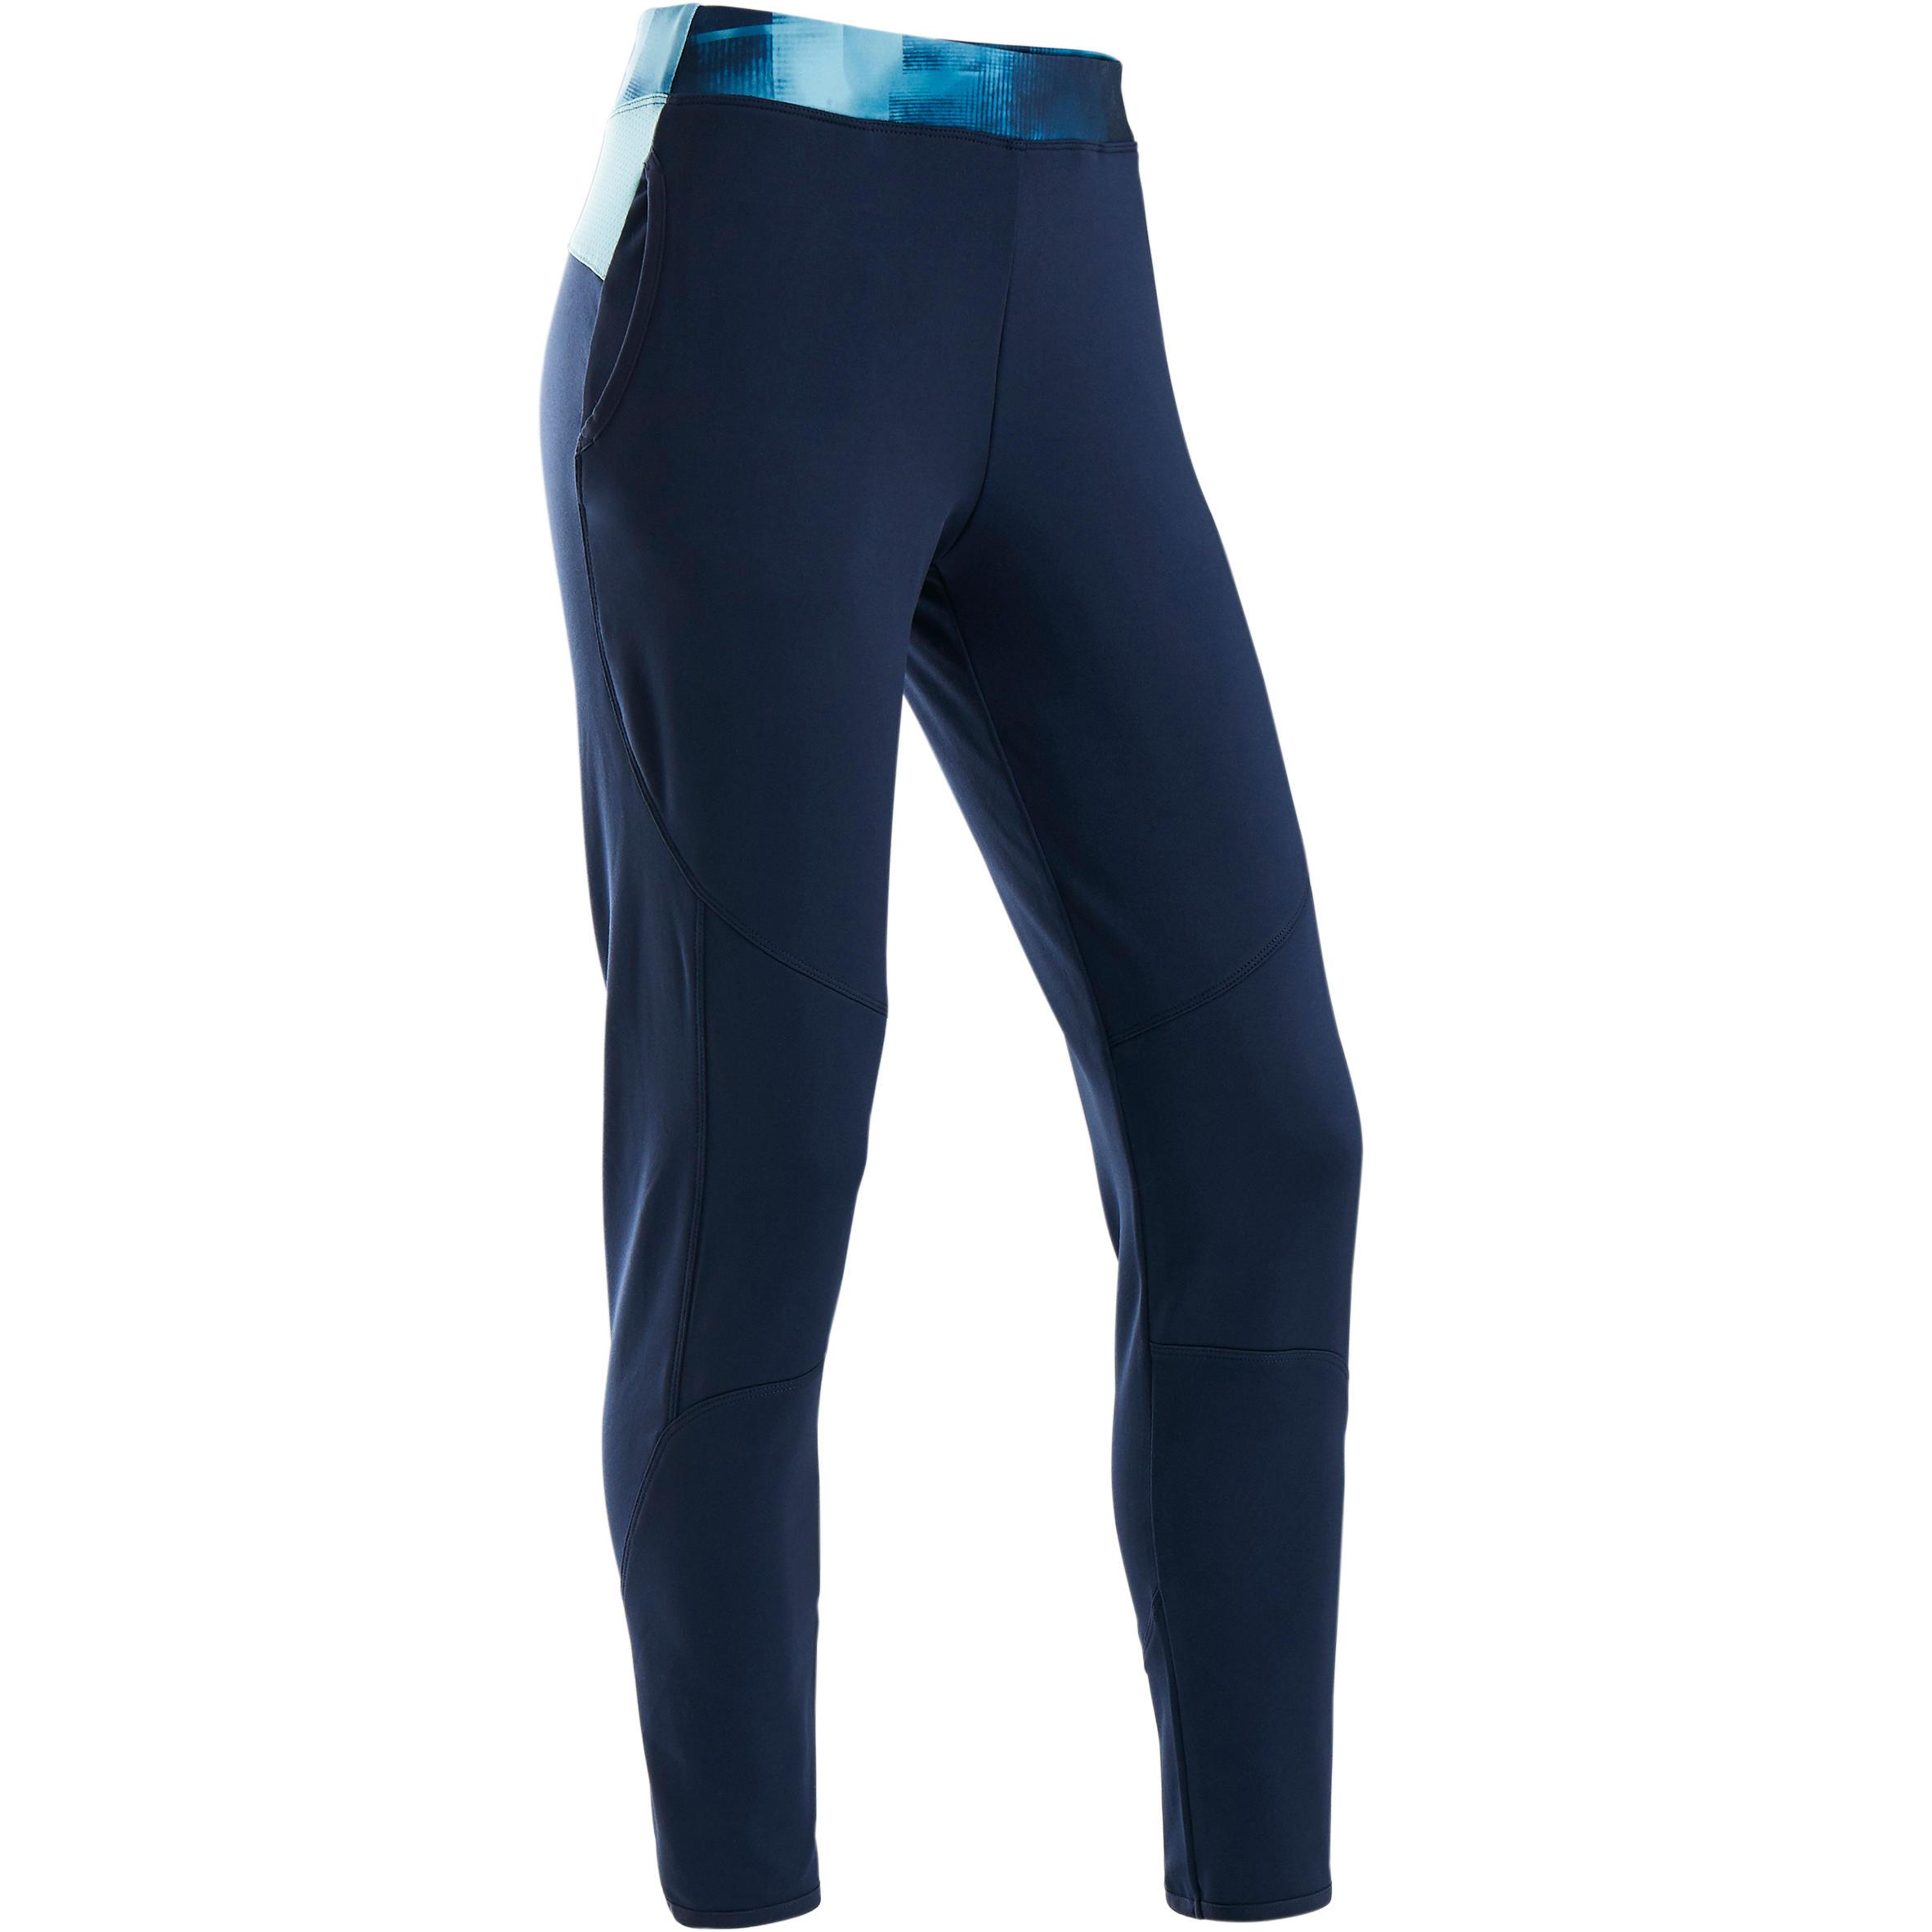 Trainingshose warm atmungsaktiv S500 GYM Kinder marineblau/ Bund blau bedruckt